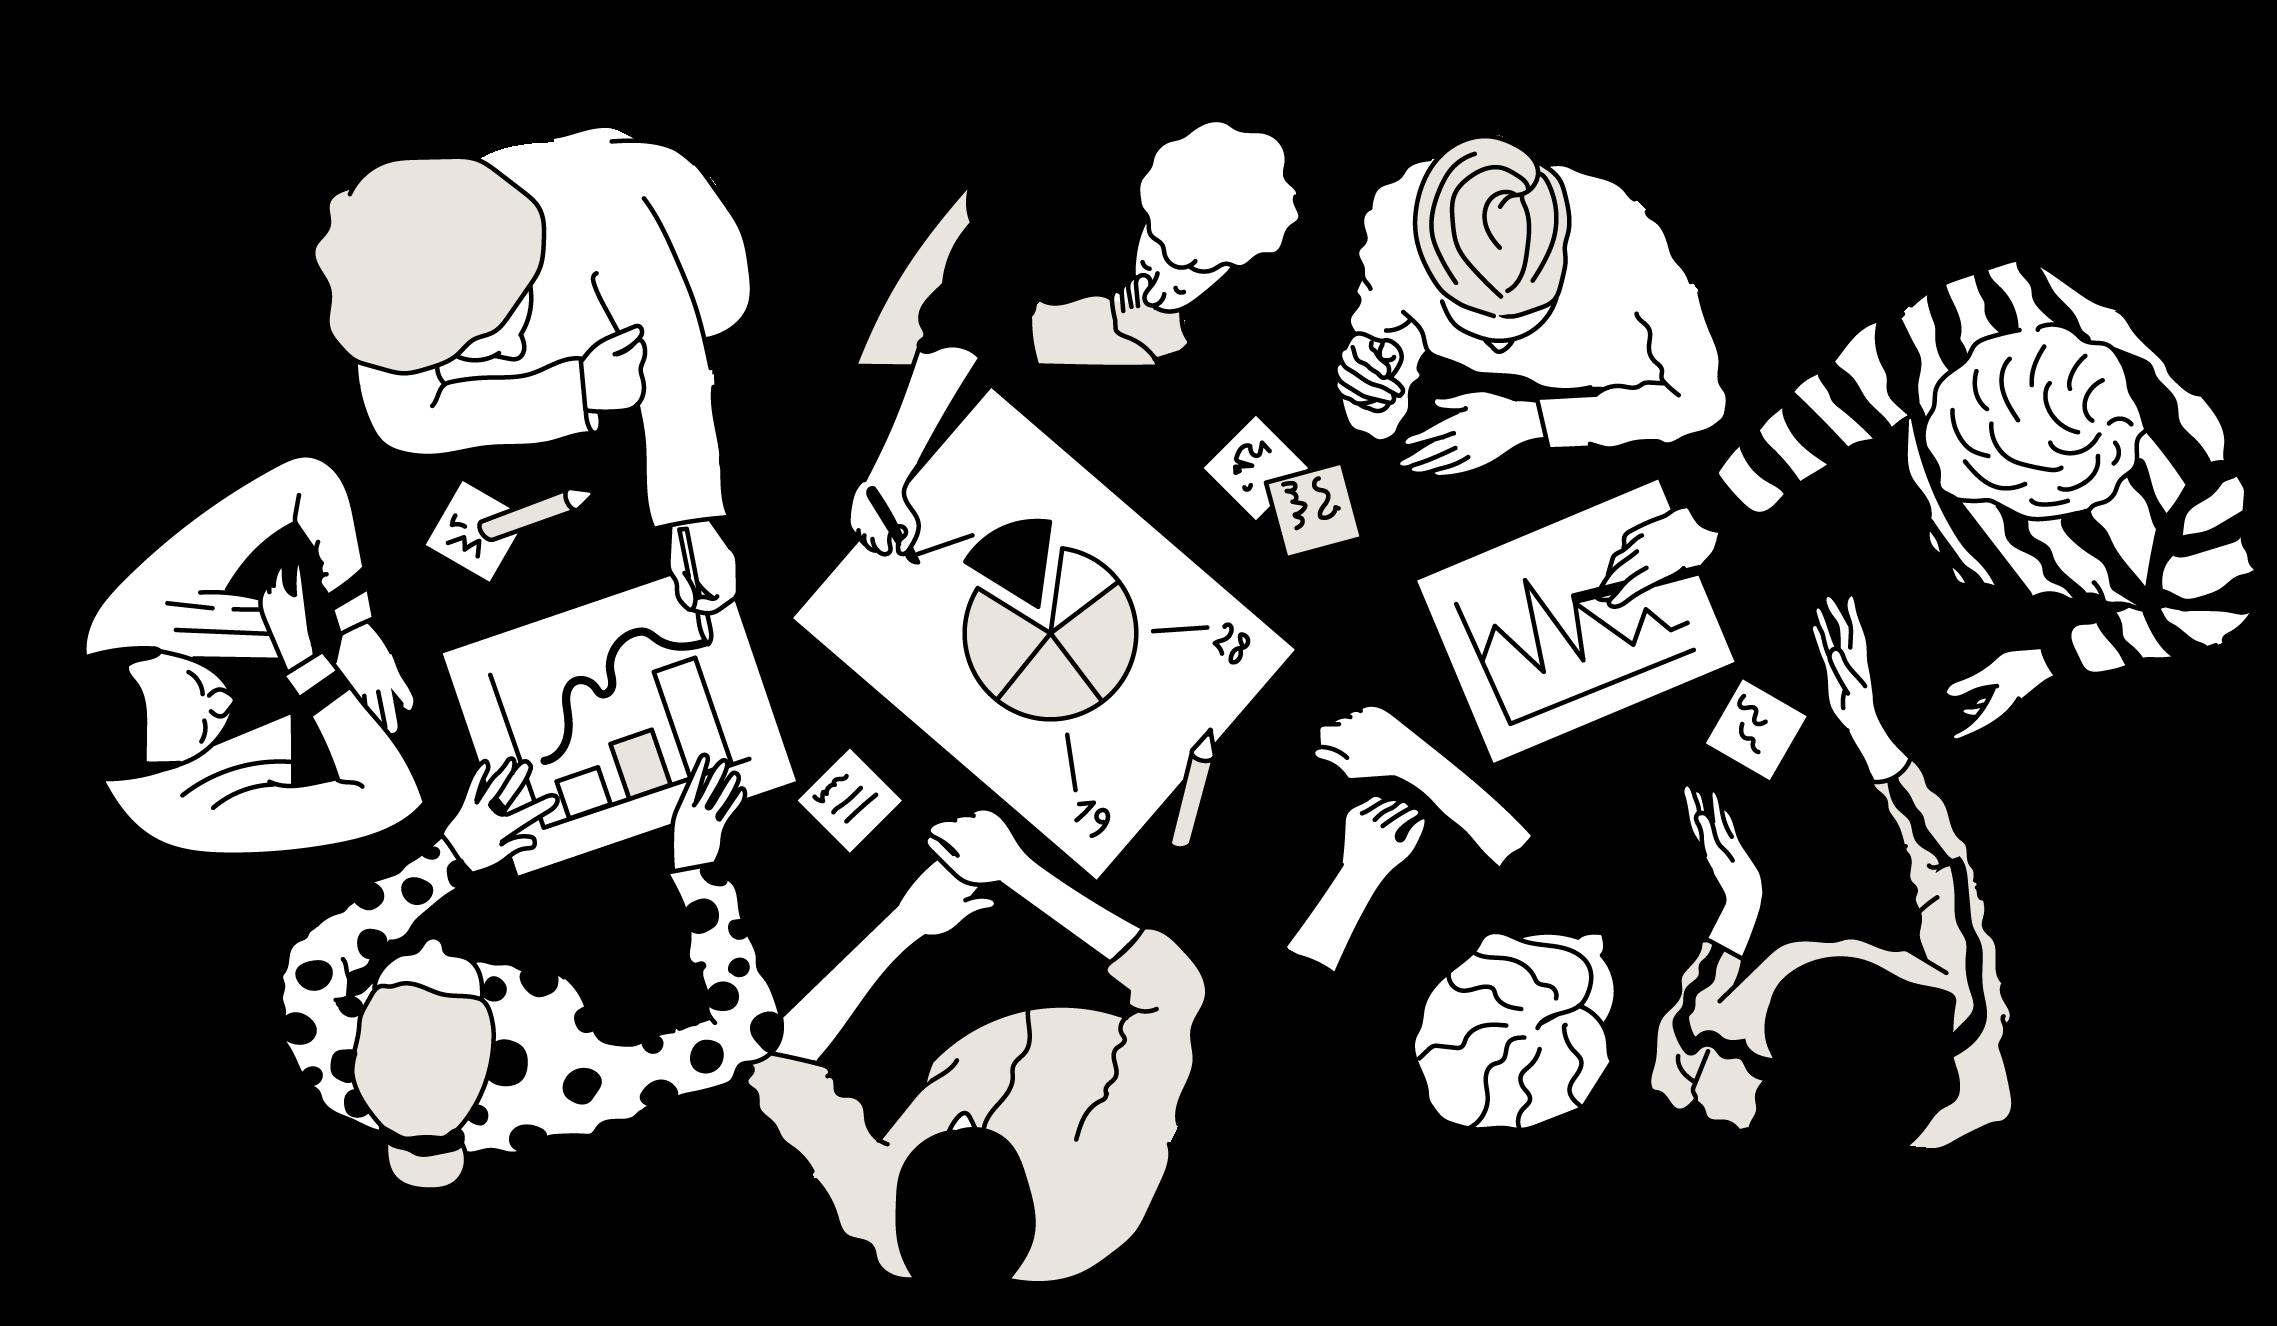 02_TV_Training_Illustrator-26.png